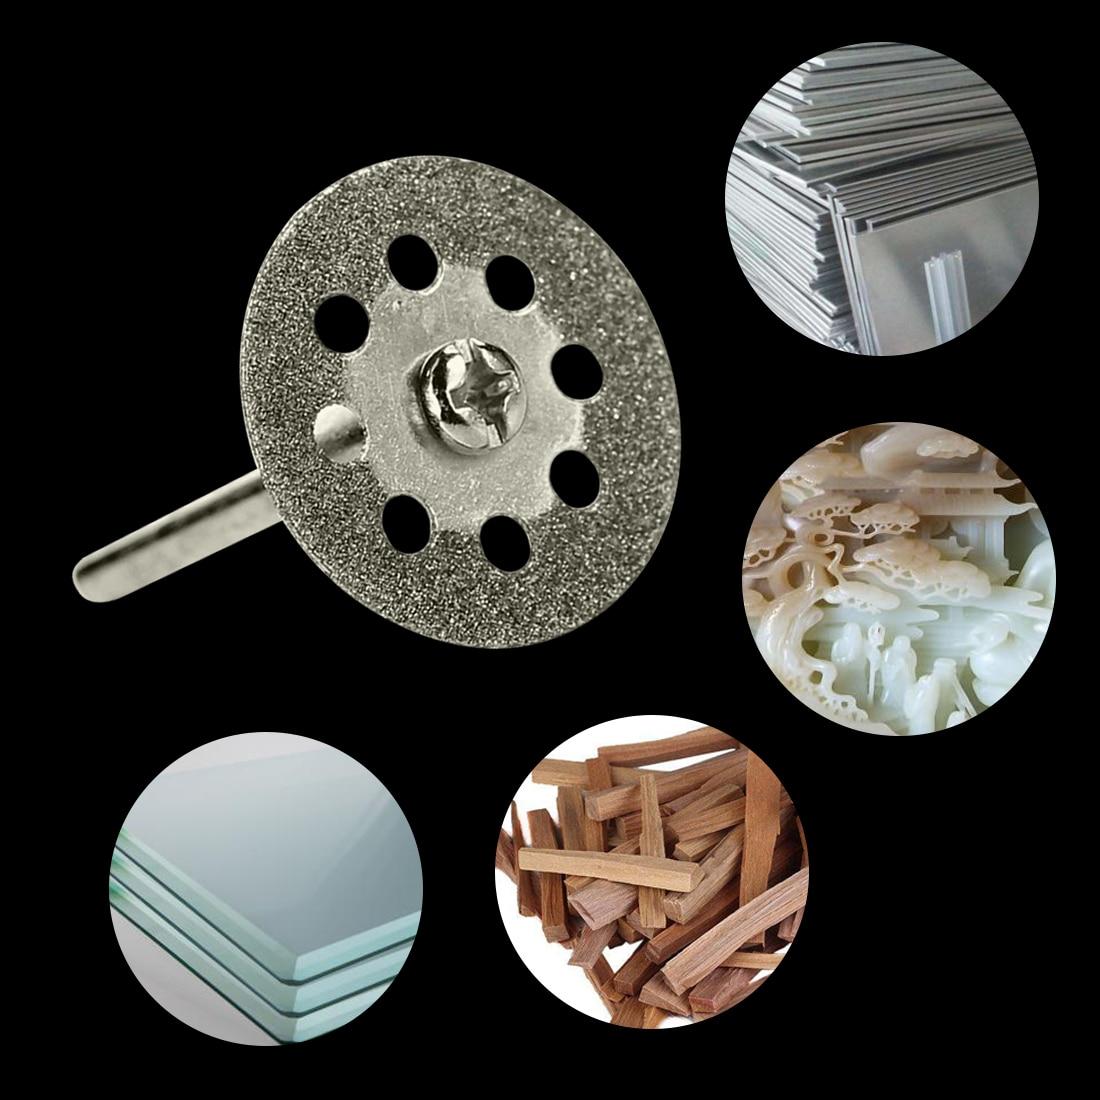 Top Dremel  Diamond Grinding Wheel Saw Mini Circular Saw Cutting Disc Dremel Rotary Tool Cutting  Disc For Diamond Tools